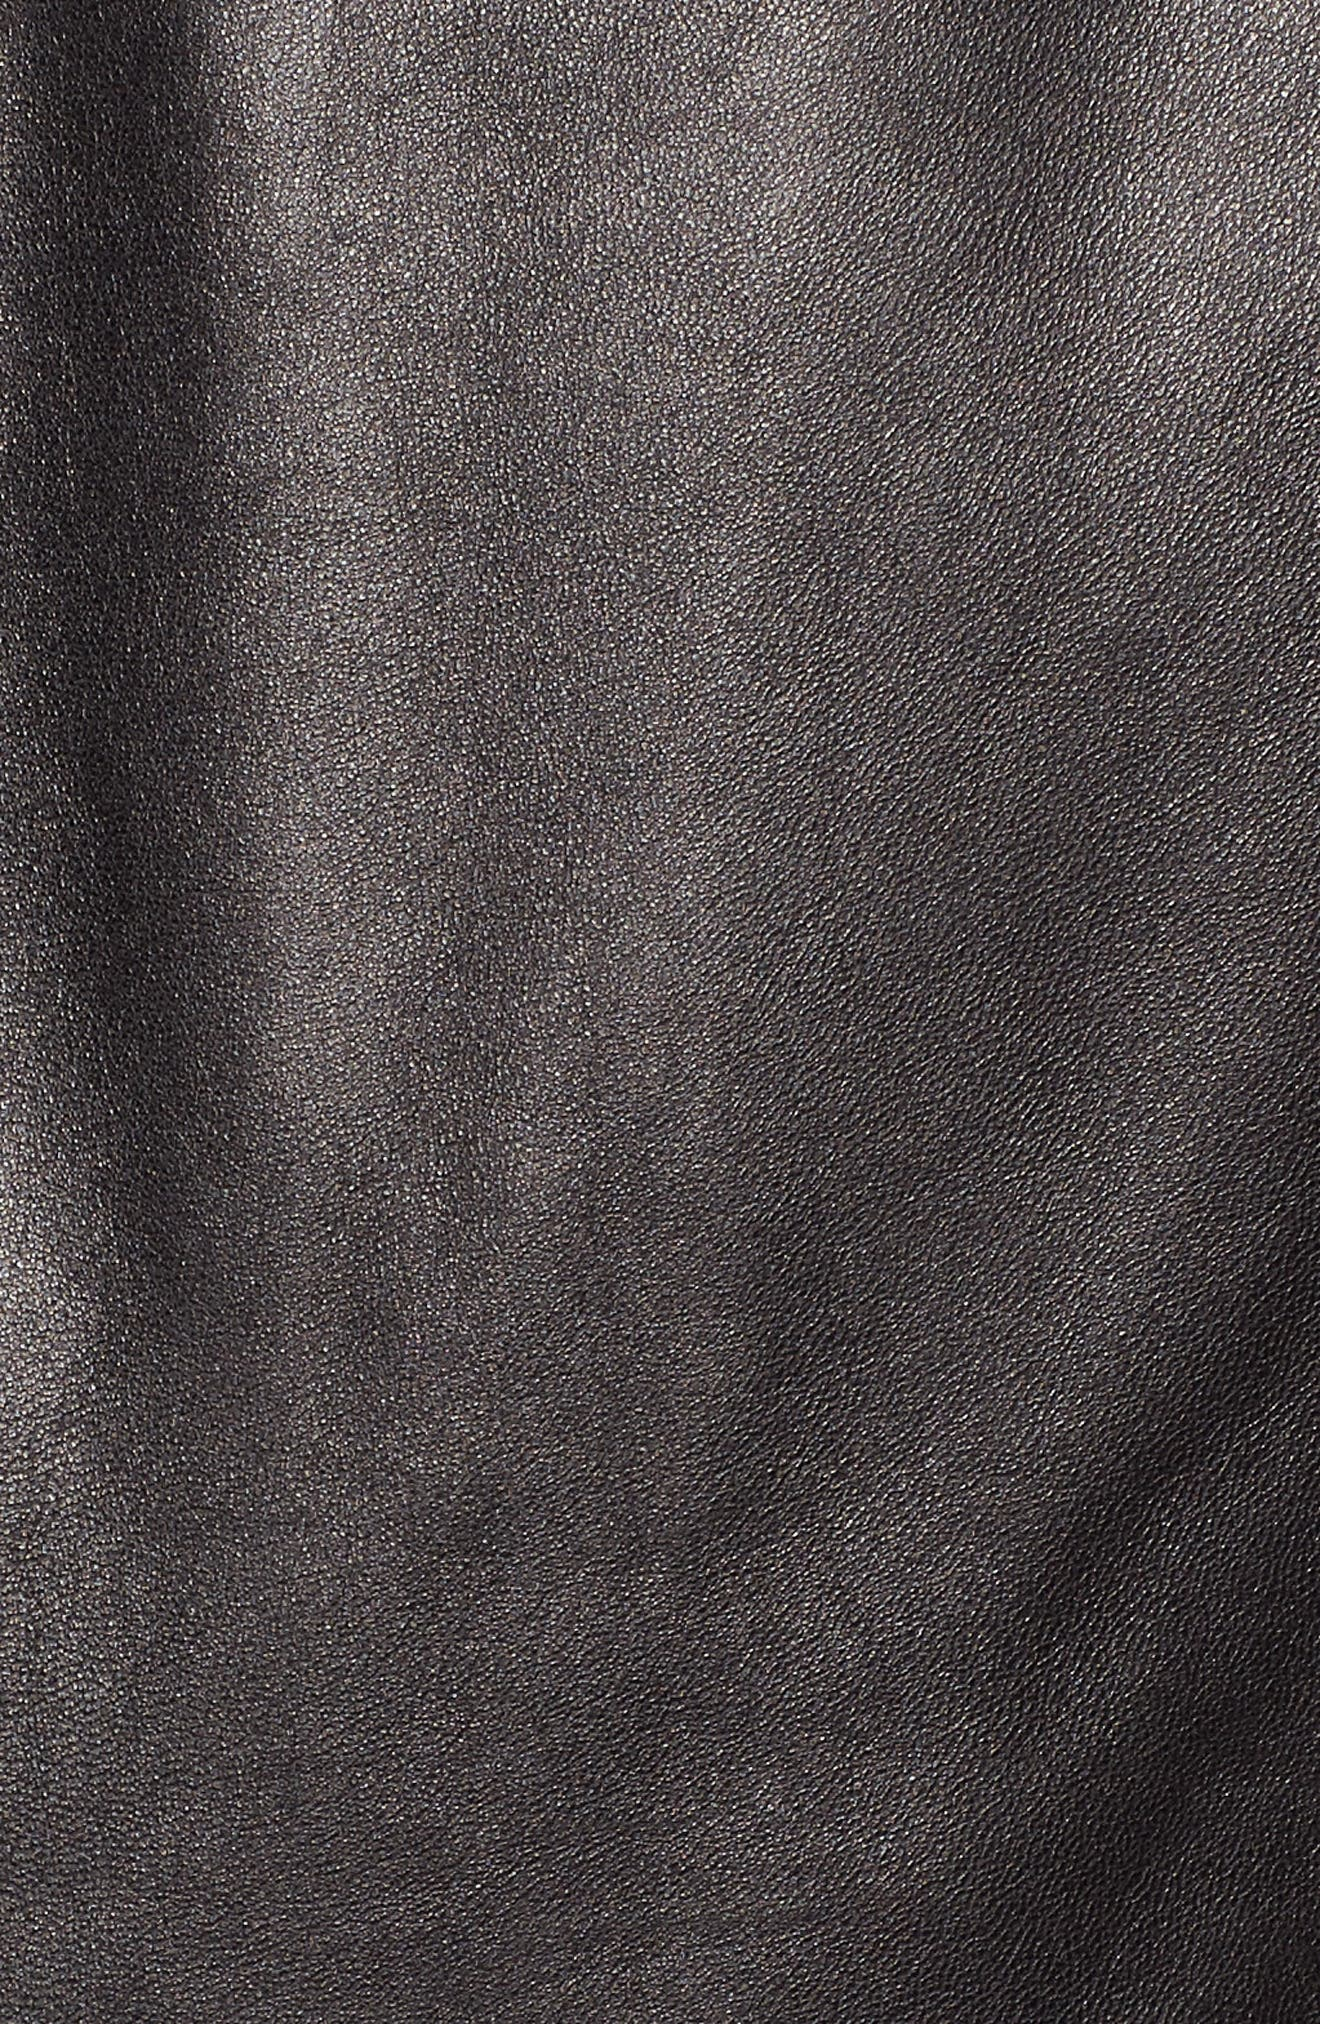 Esther Leather Trucker Jacket,                             Alternate thumbnail 7, color,                             BLACK